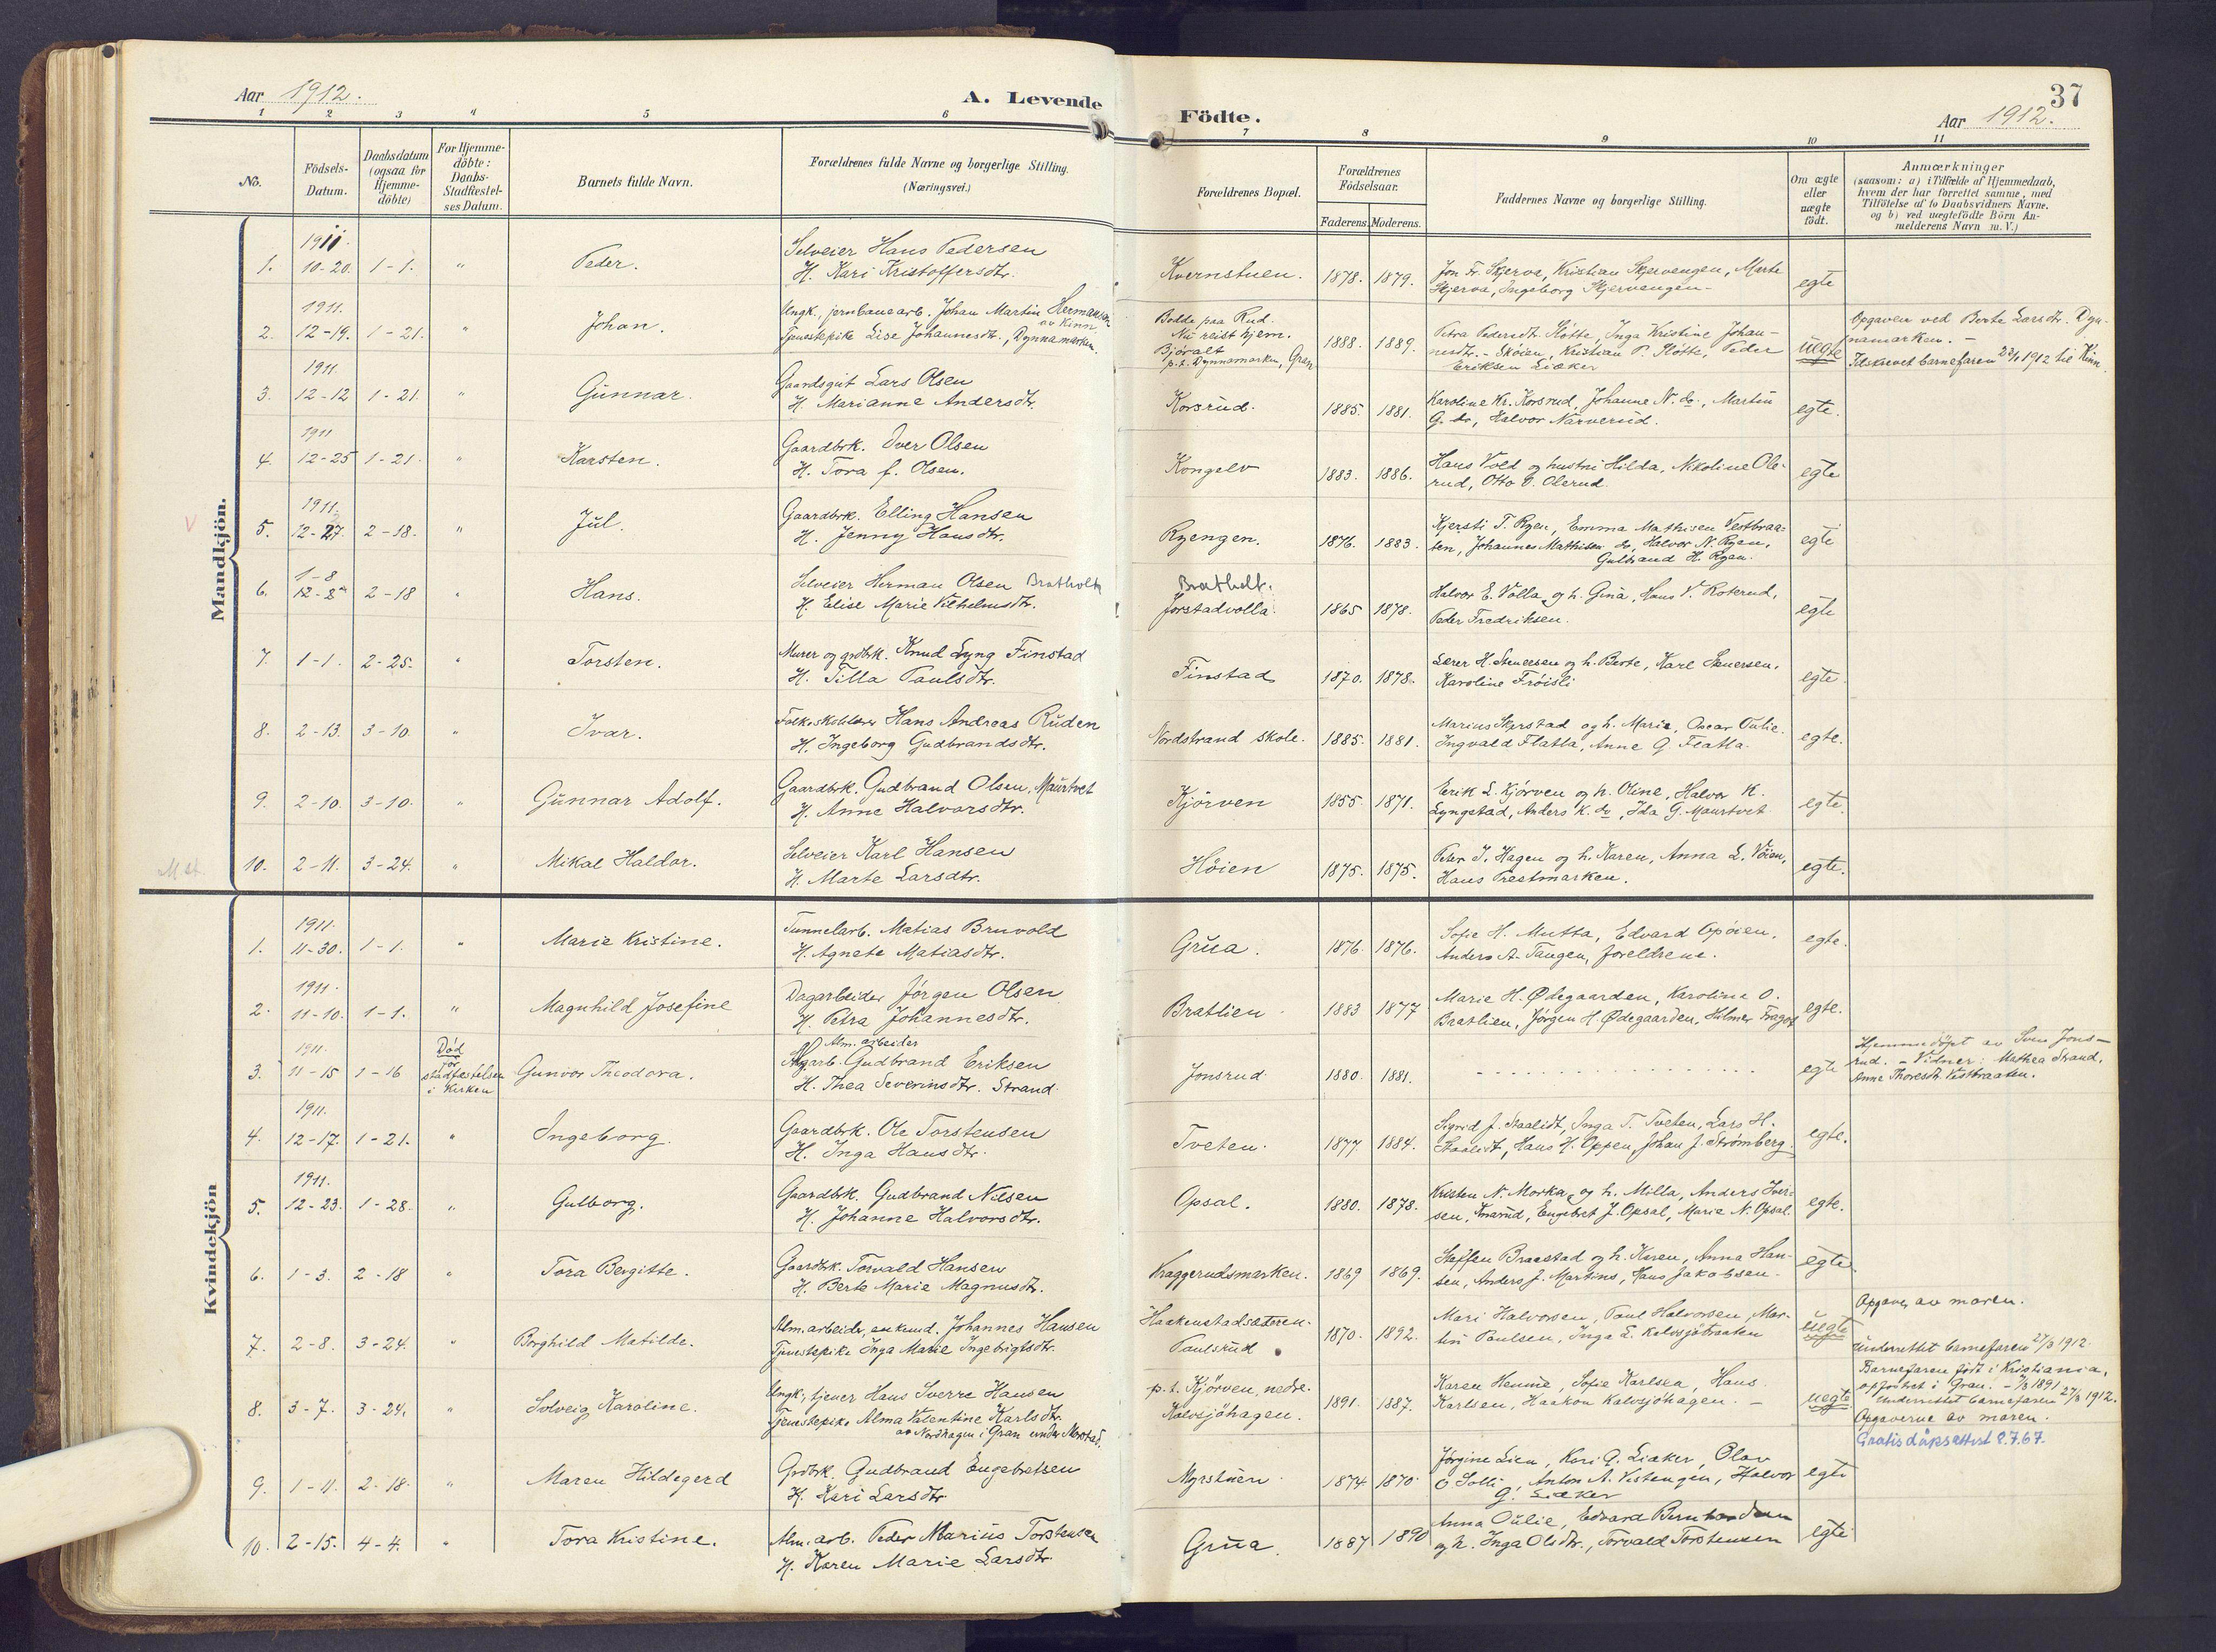 SAH, Lunner prestekontor, H/Ha/Haa/L0001: Ministerialbok nr. 1, 1907-1922, s. 37